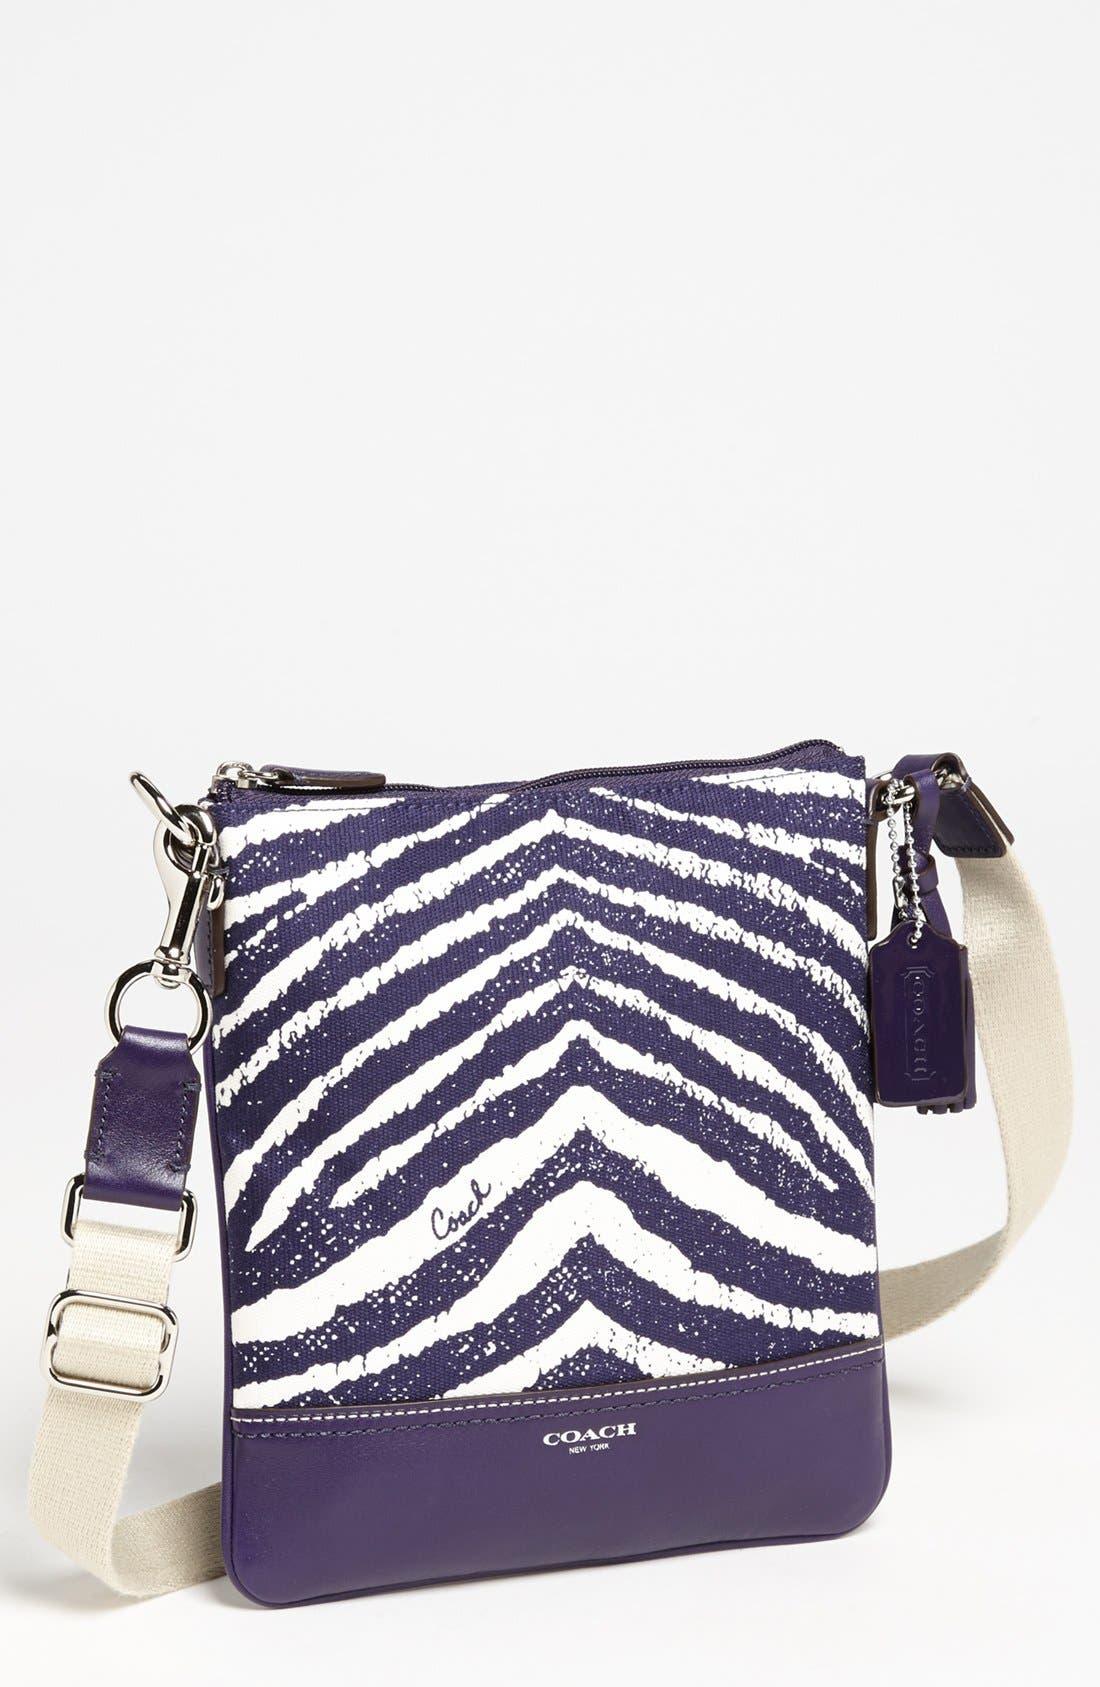 Main Image - COACH 'Legacy - Swingpack' Zebra Print Crossbody Bag, Small